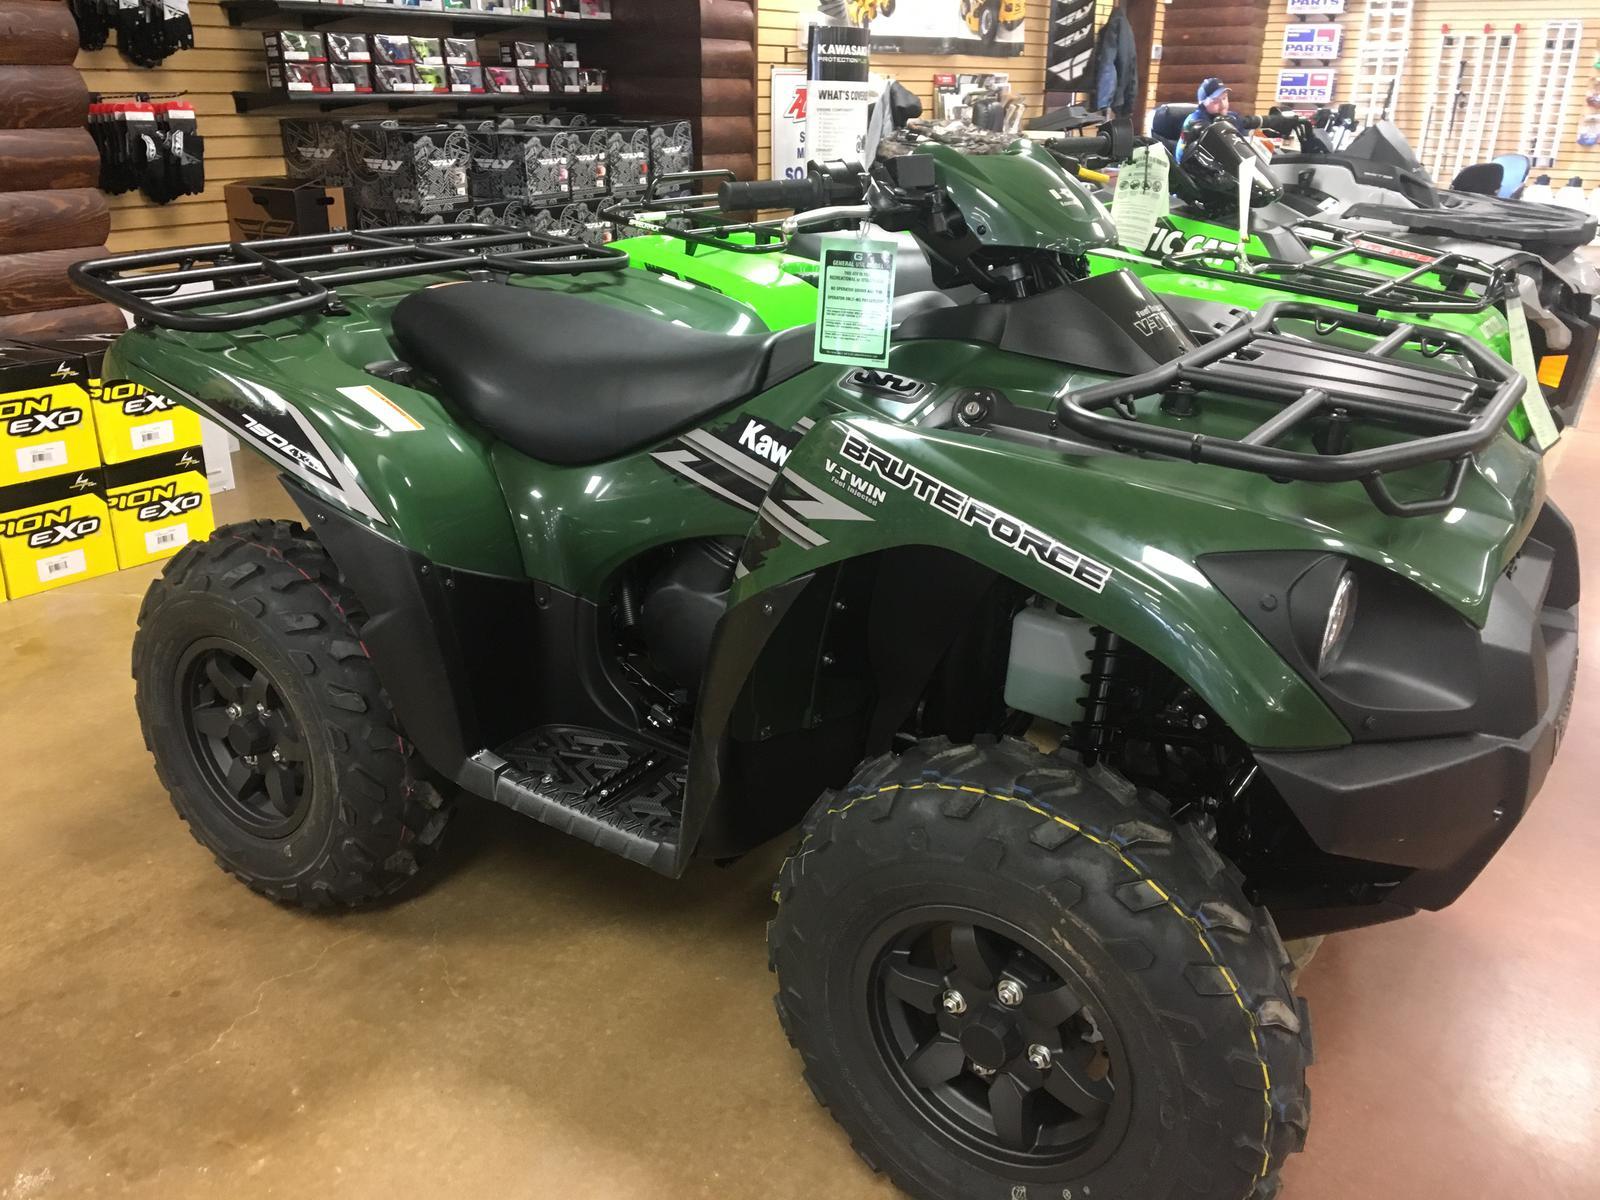 2018 Kawasaki Brute Force® 750 4x4i for sale in Bartlesville, OK.